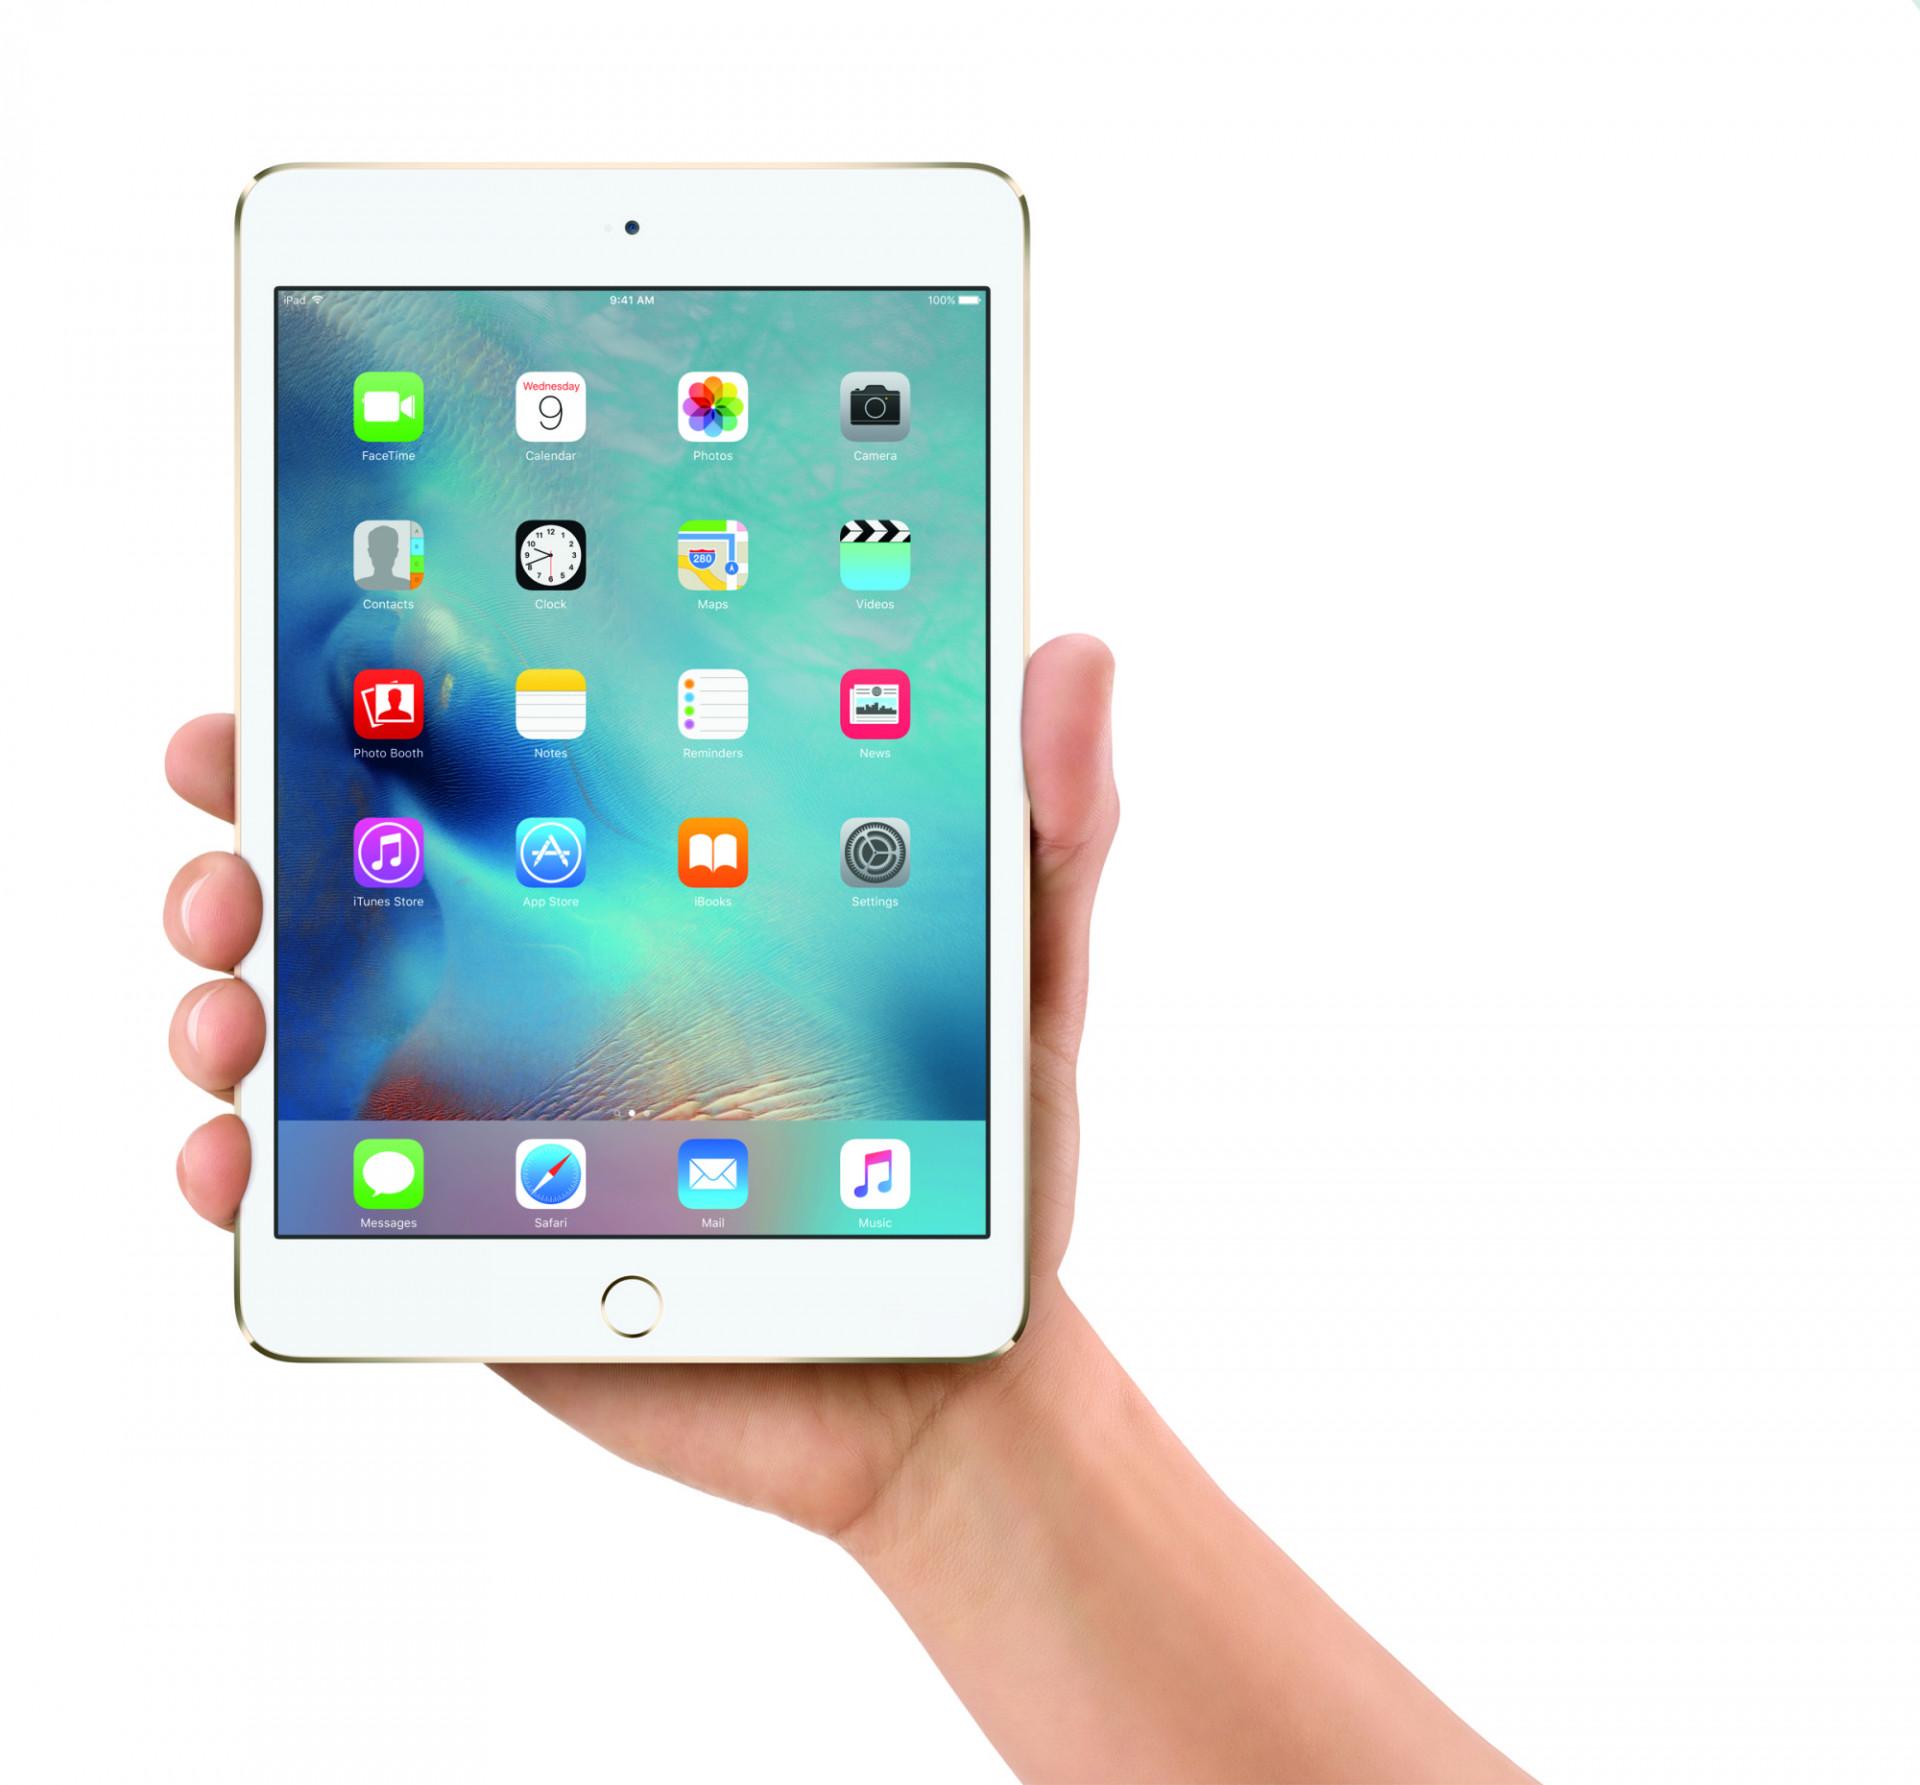 5 jahre ipad mini apples unerw nschtes tablet heise online. Black Bedroom Furniture Sets. Home Design Ideas